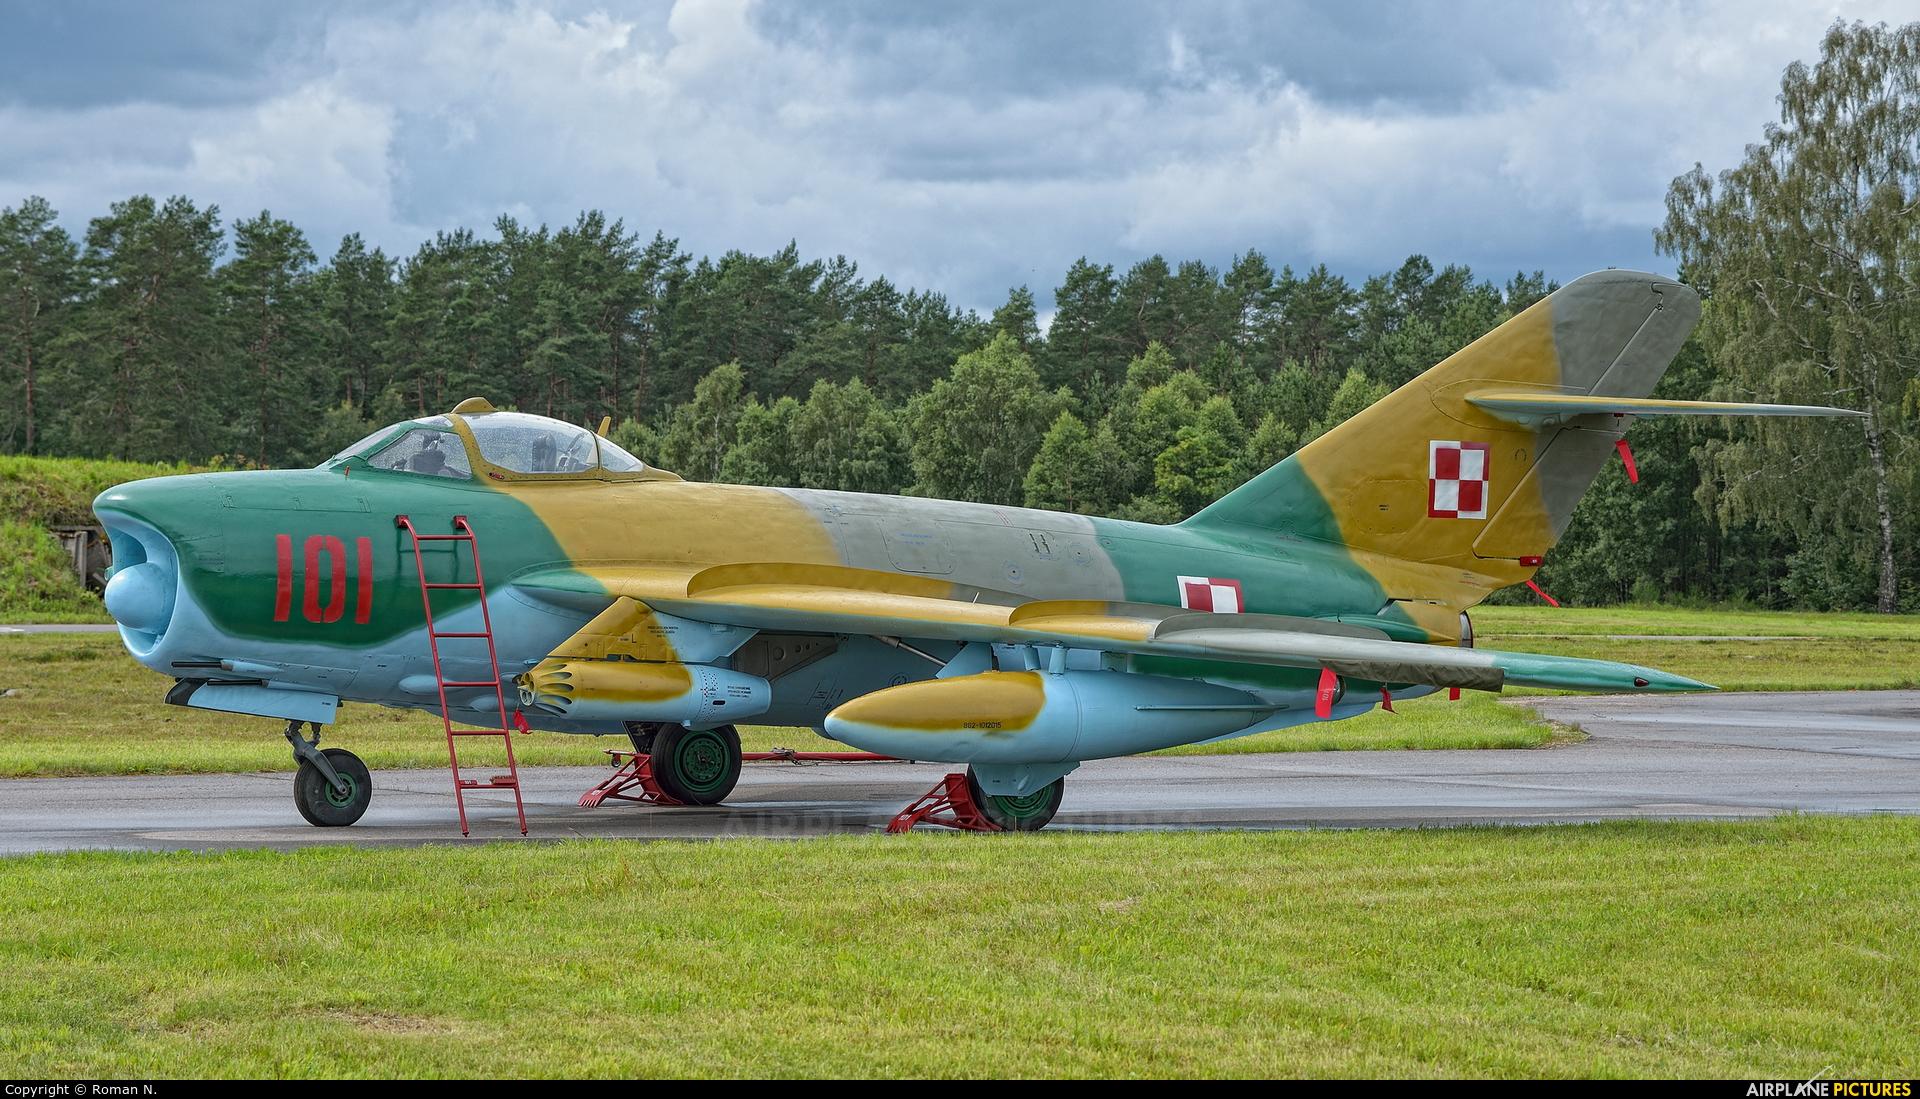 Poland - Navy 101 aircraft at Siemirowice